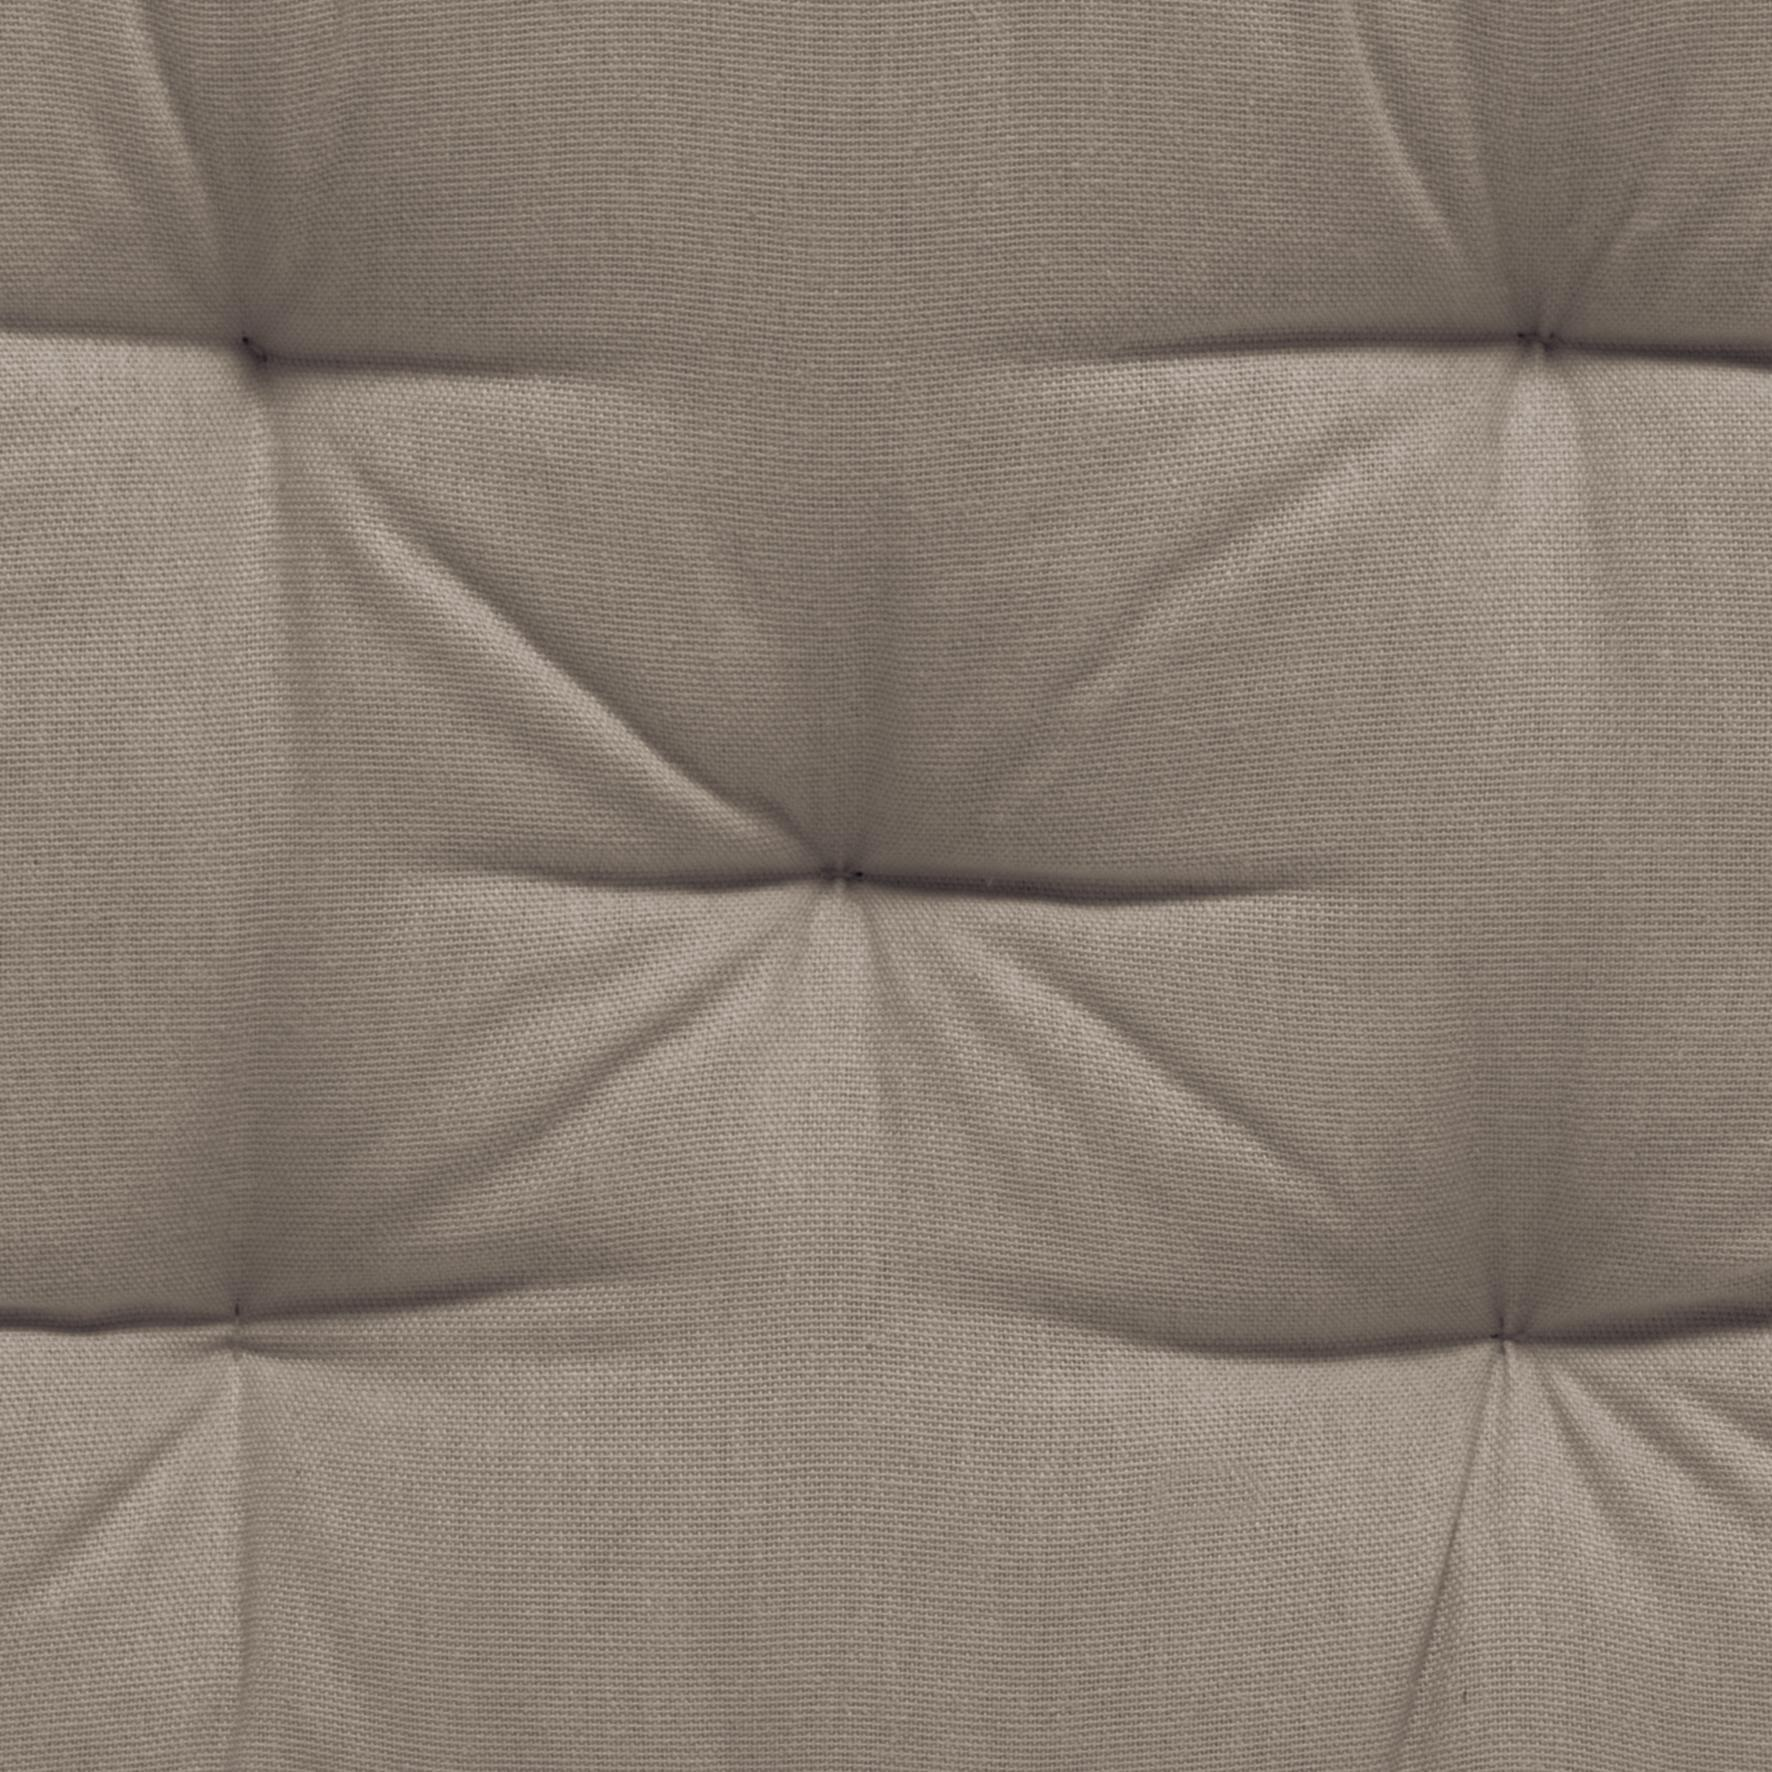 Futon INSPIRE Clea tortora 60x60 cm - 2